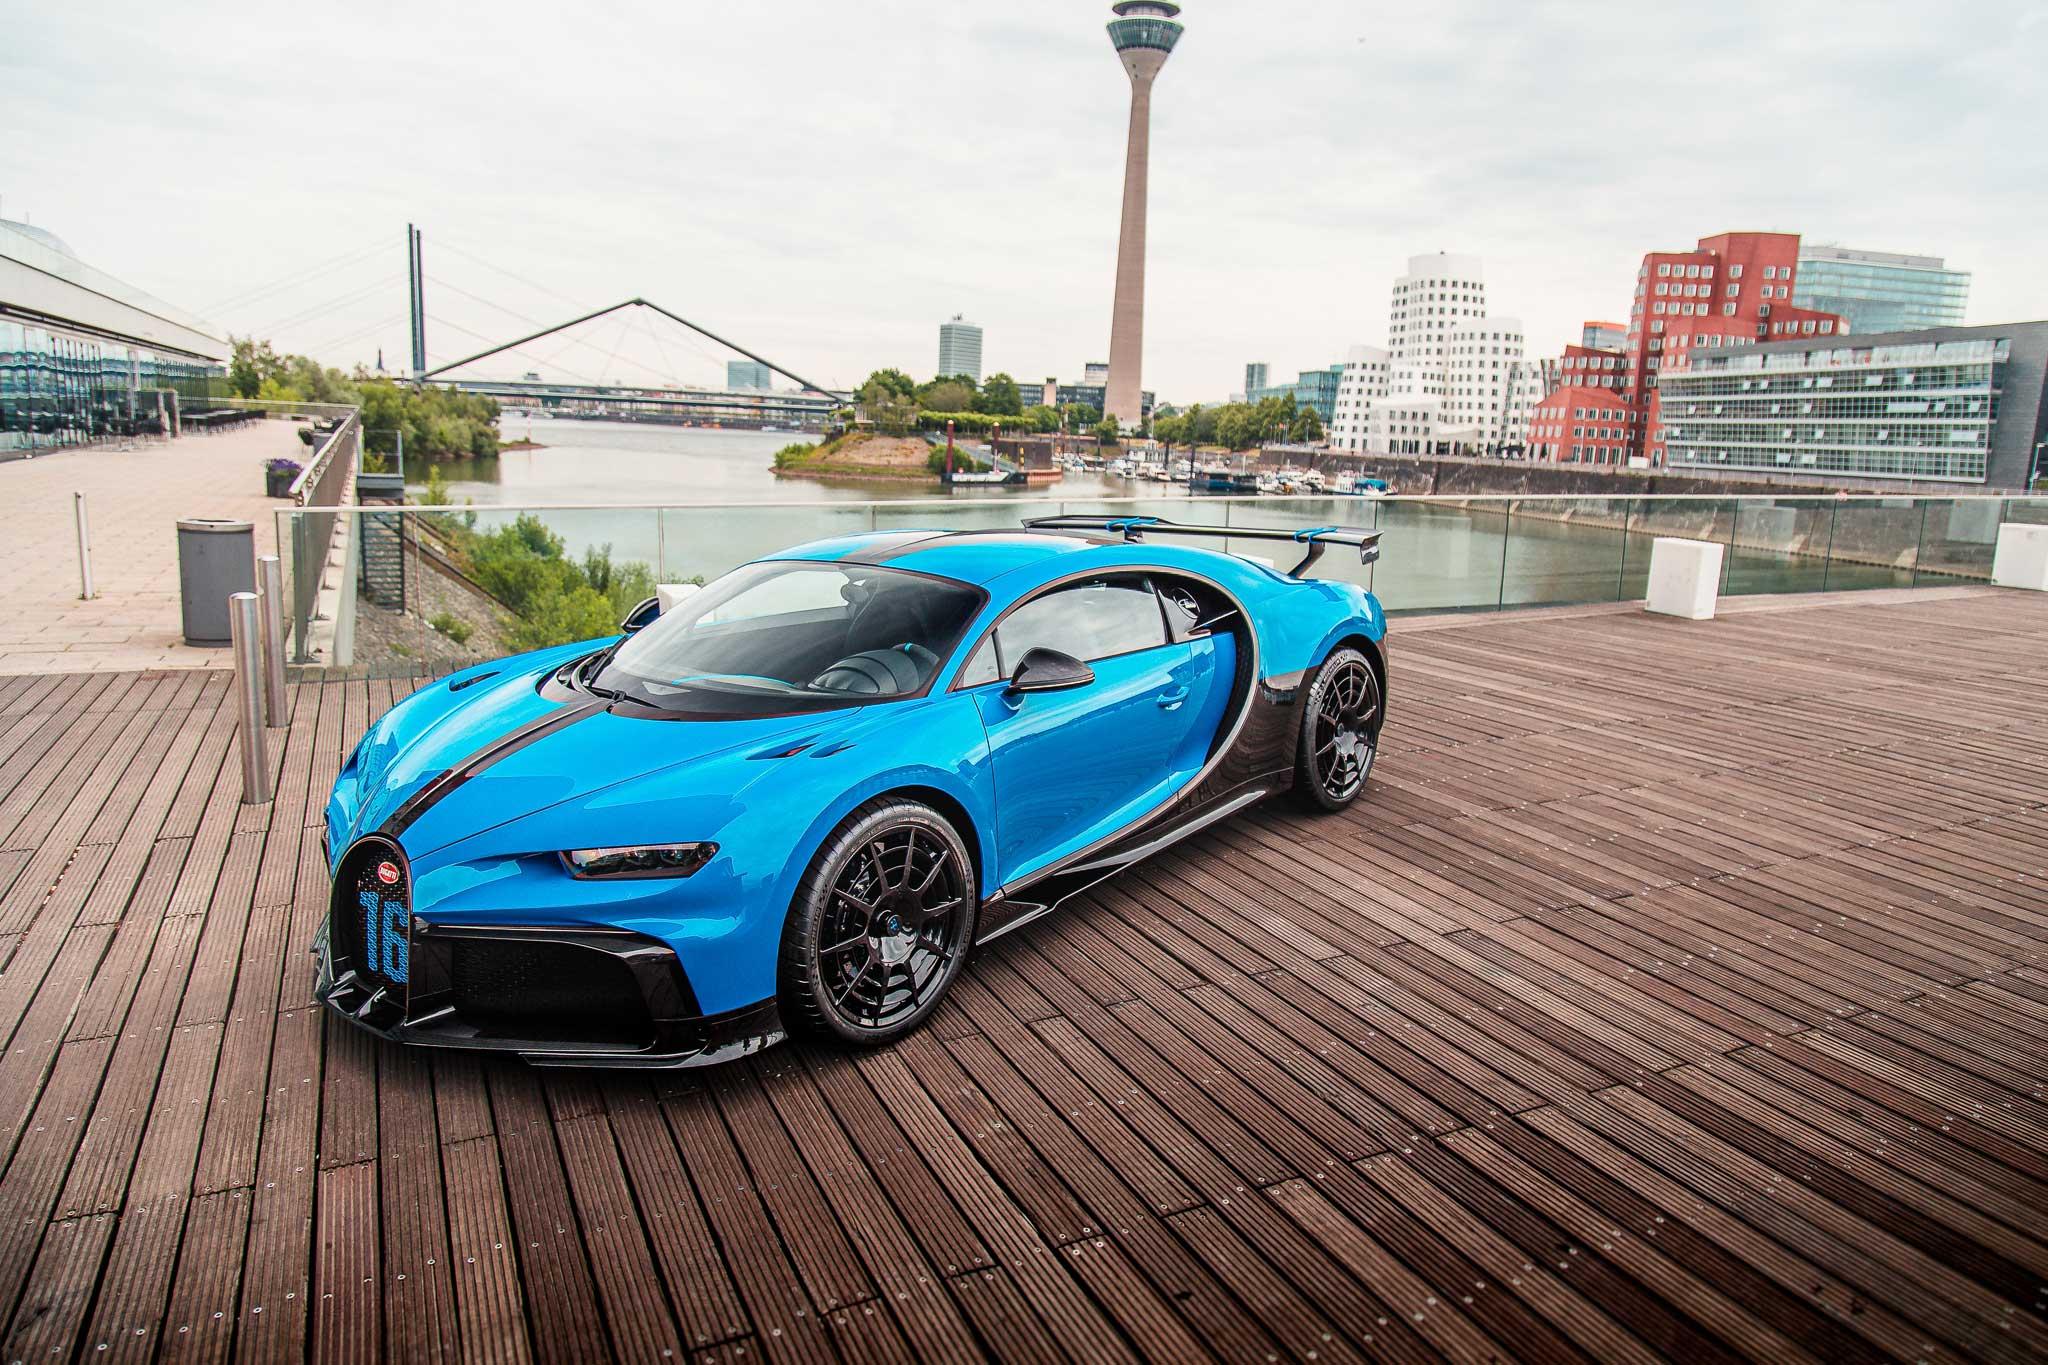 Bugatti Düsseldorf presents the new Chiron Pur Sport at European Roadshow